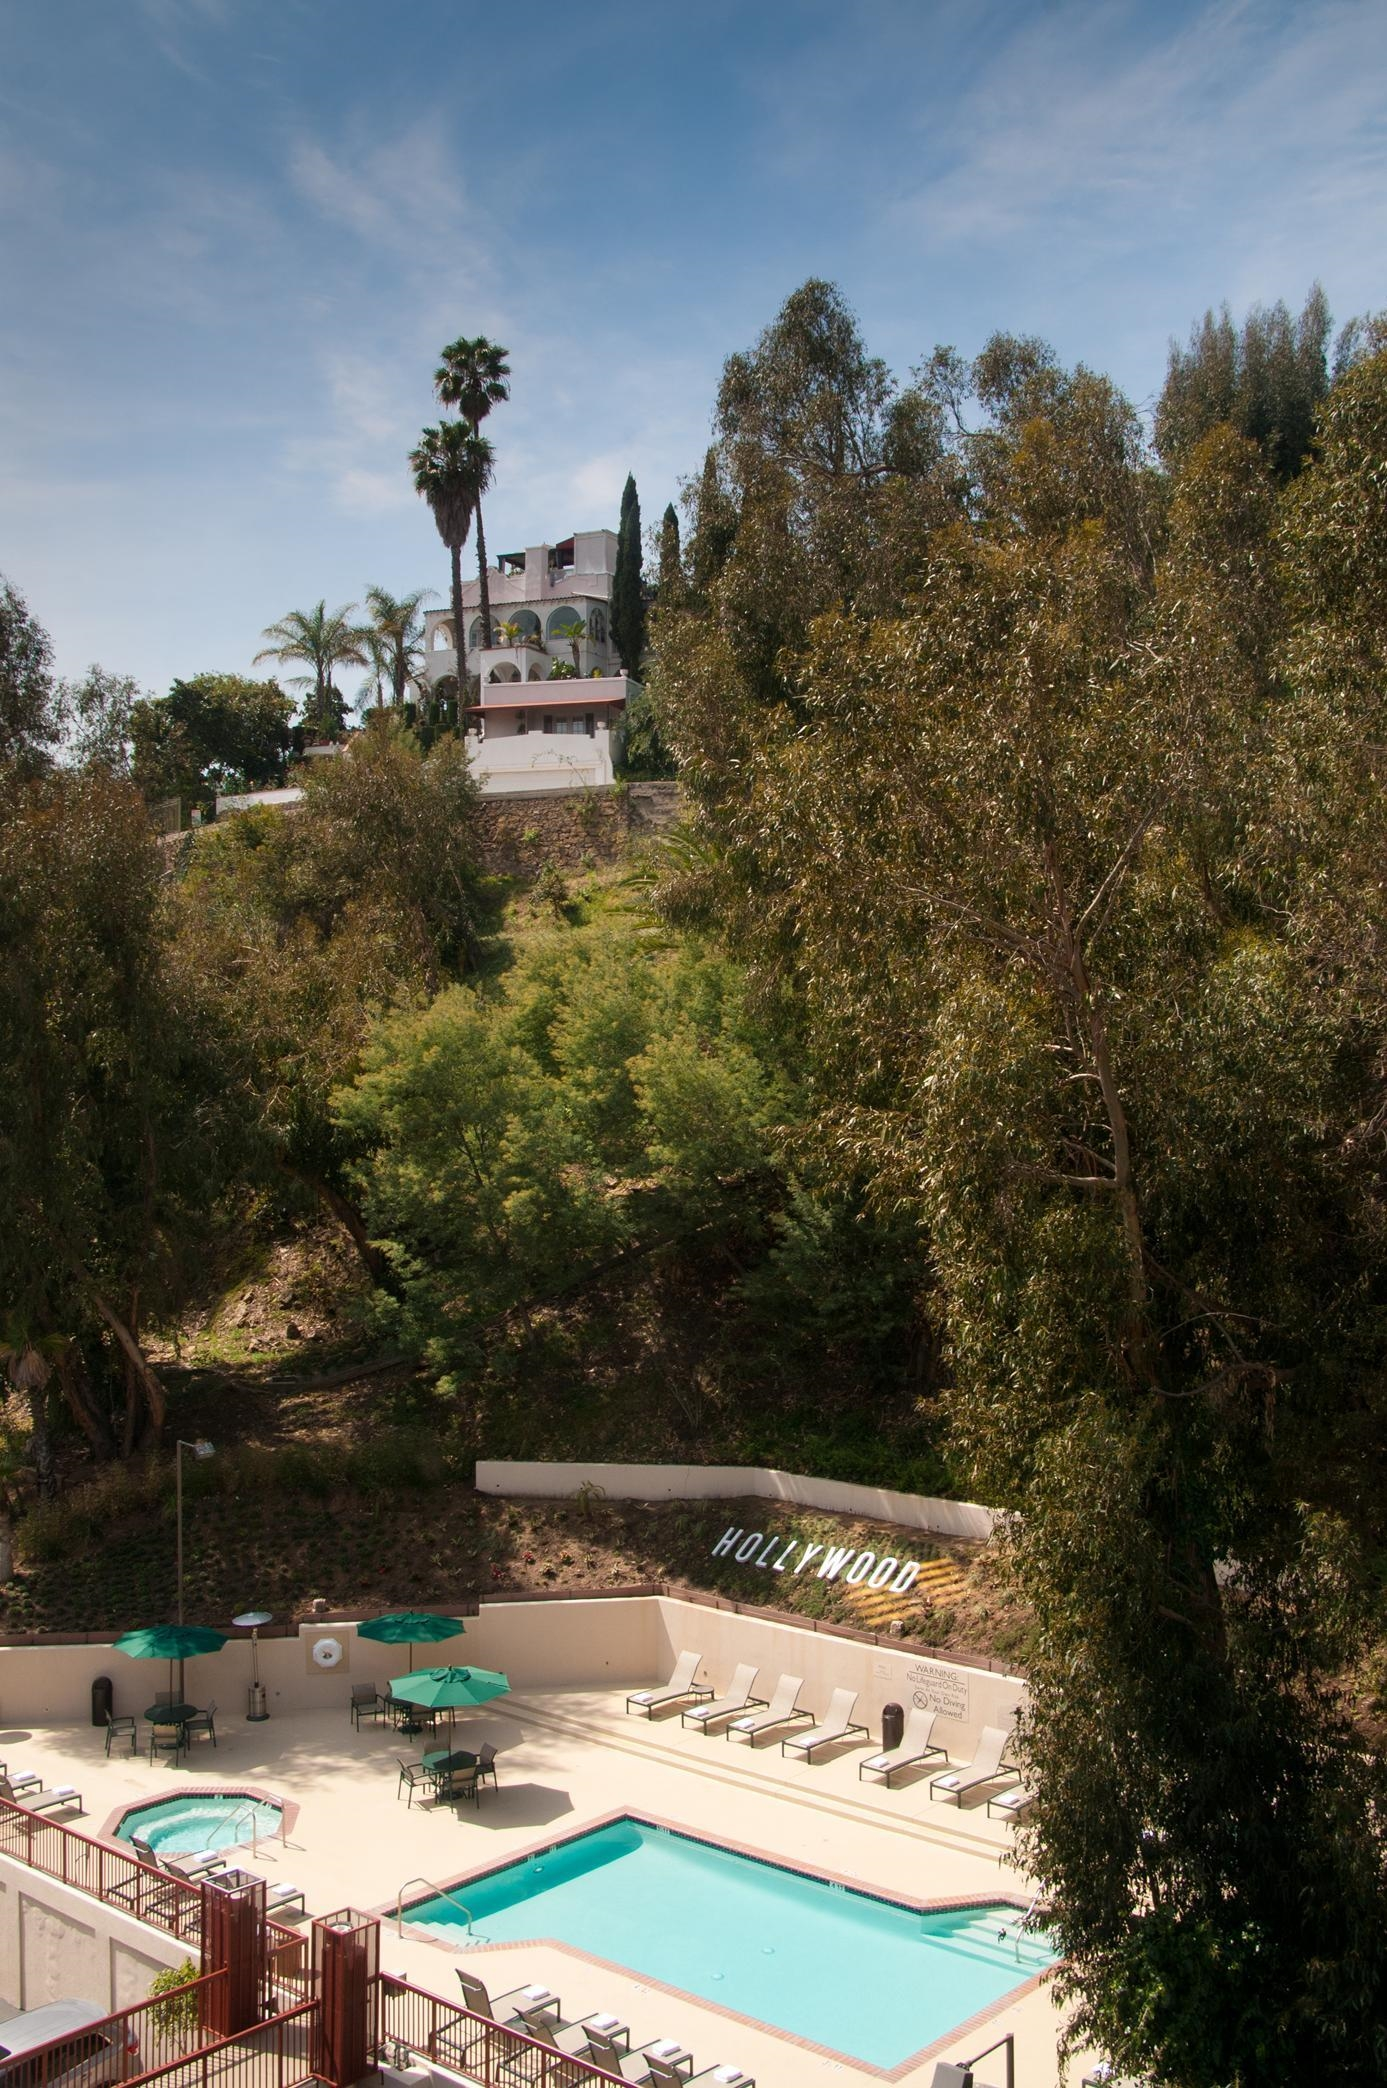 Hilton Garden Inn Los Angeles/Hollywood image 7